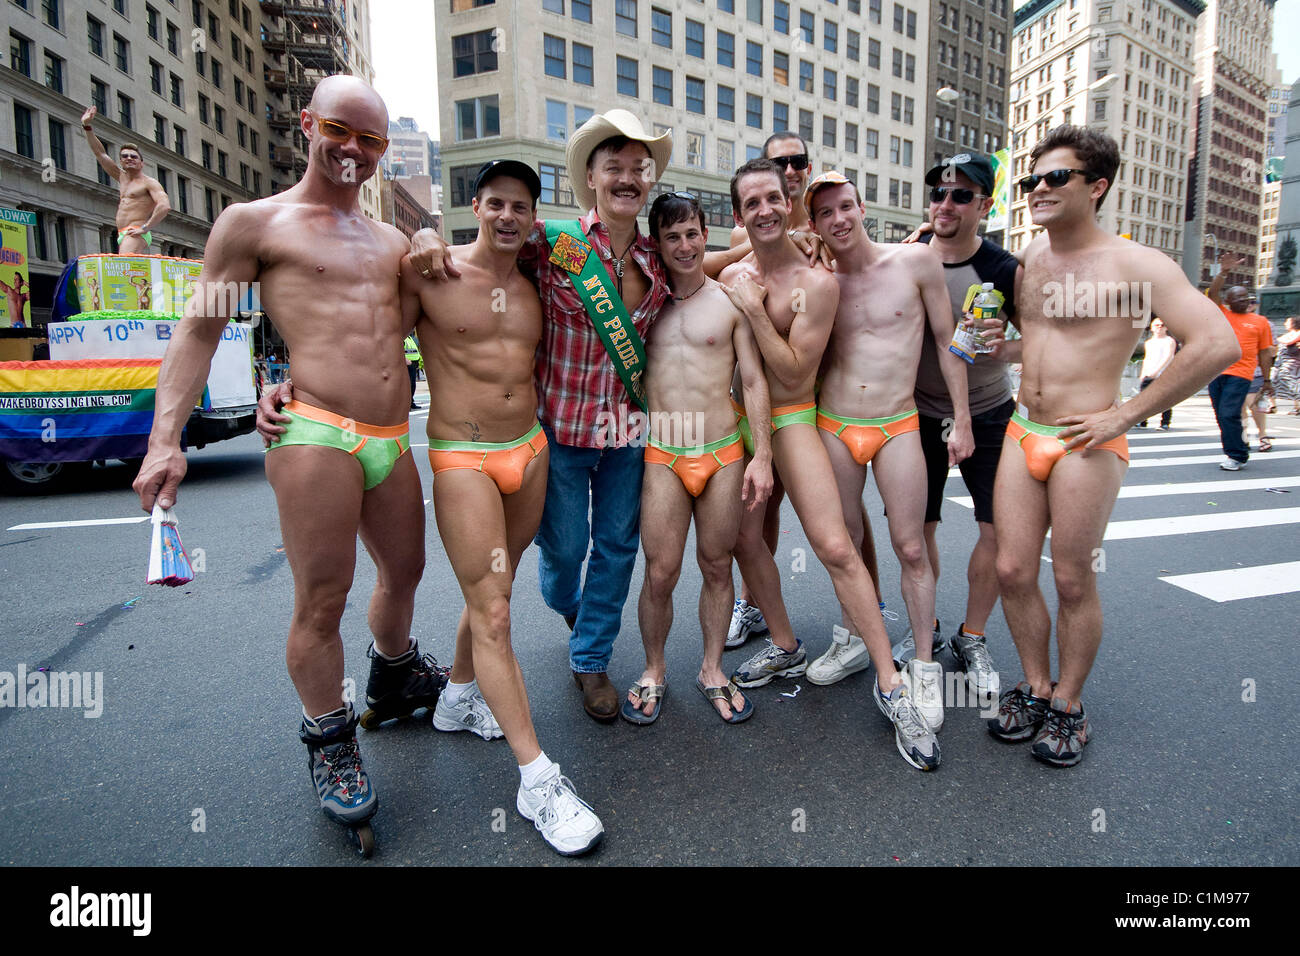 from Finn gay pride new york city 2009